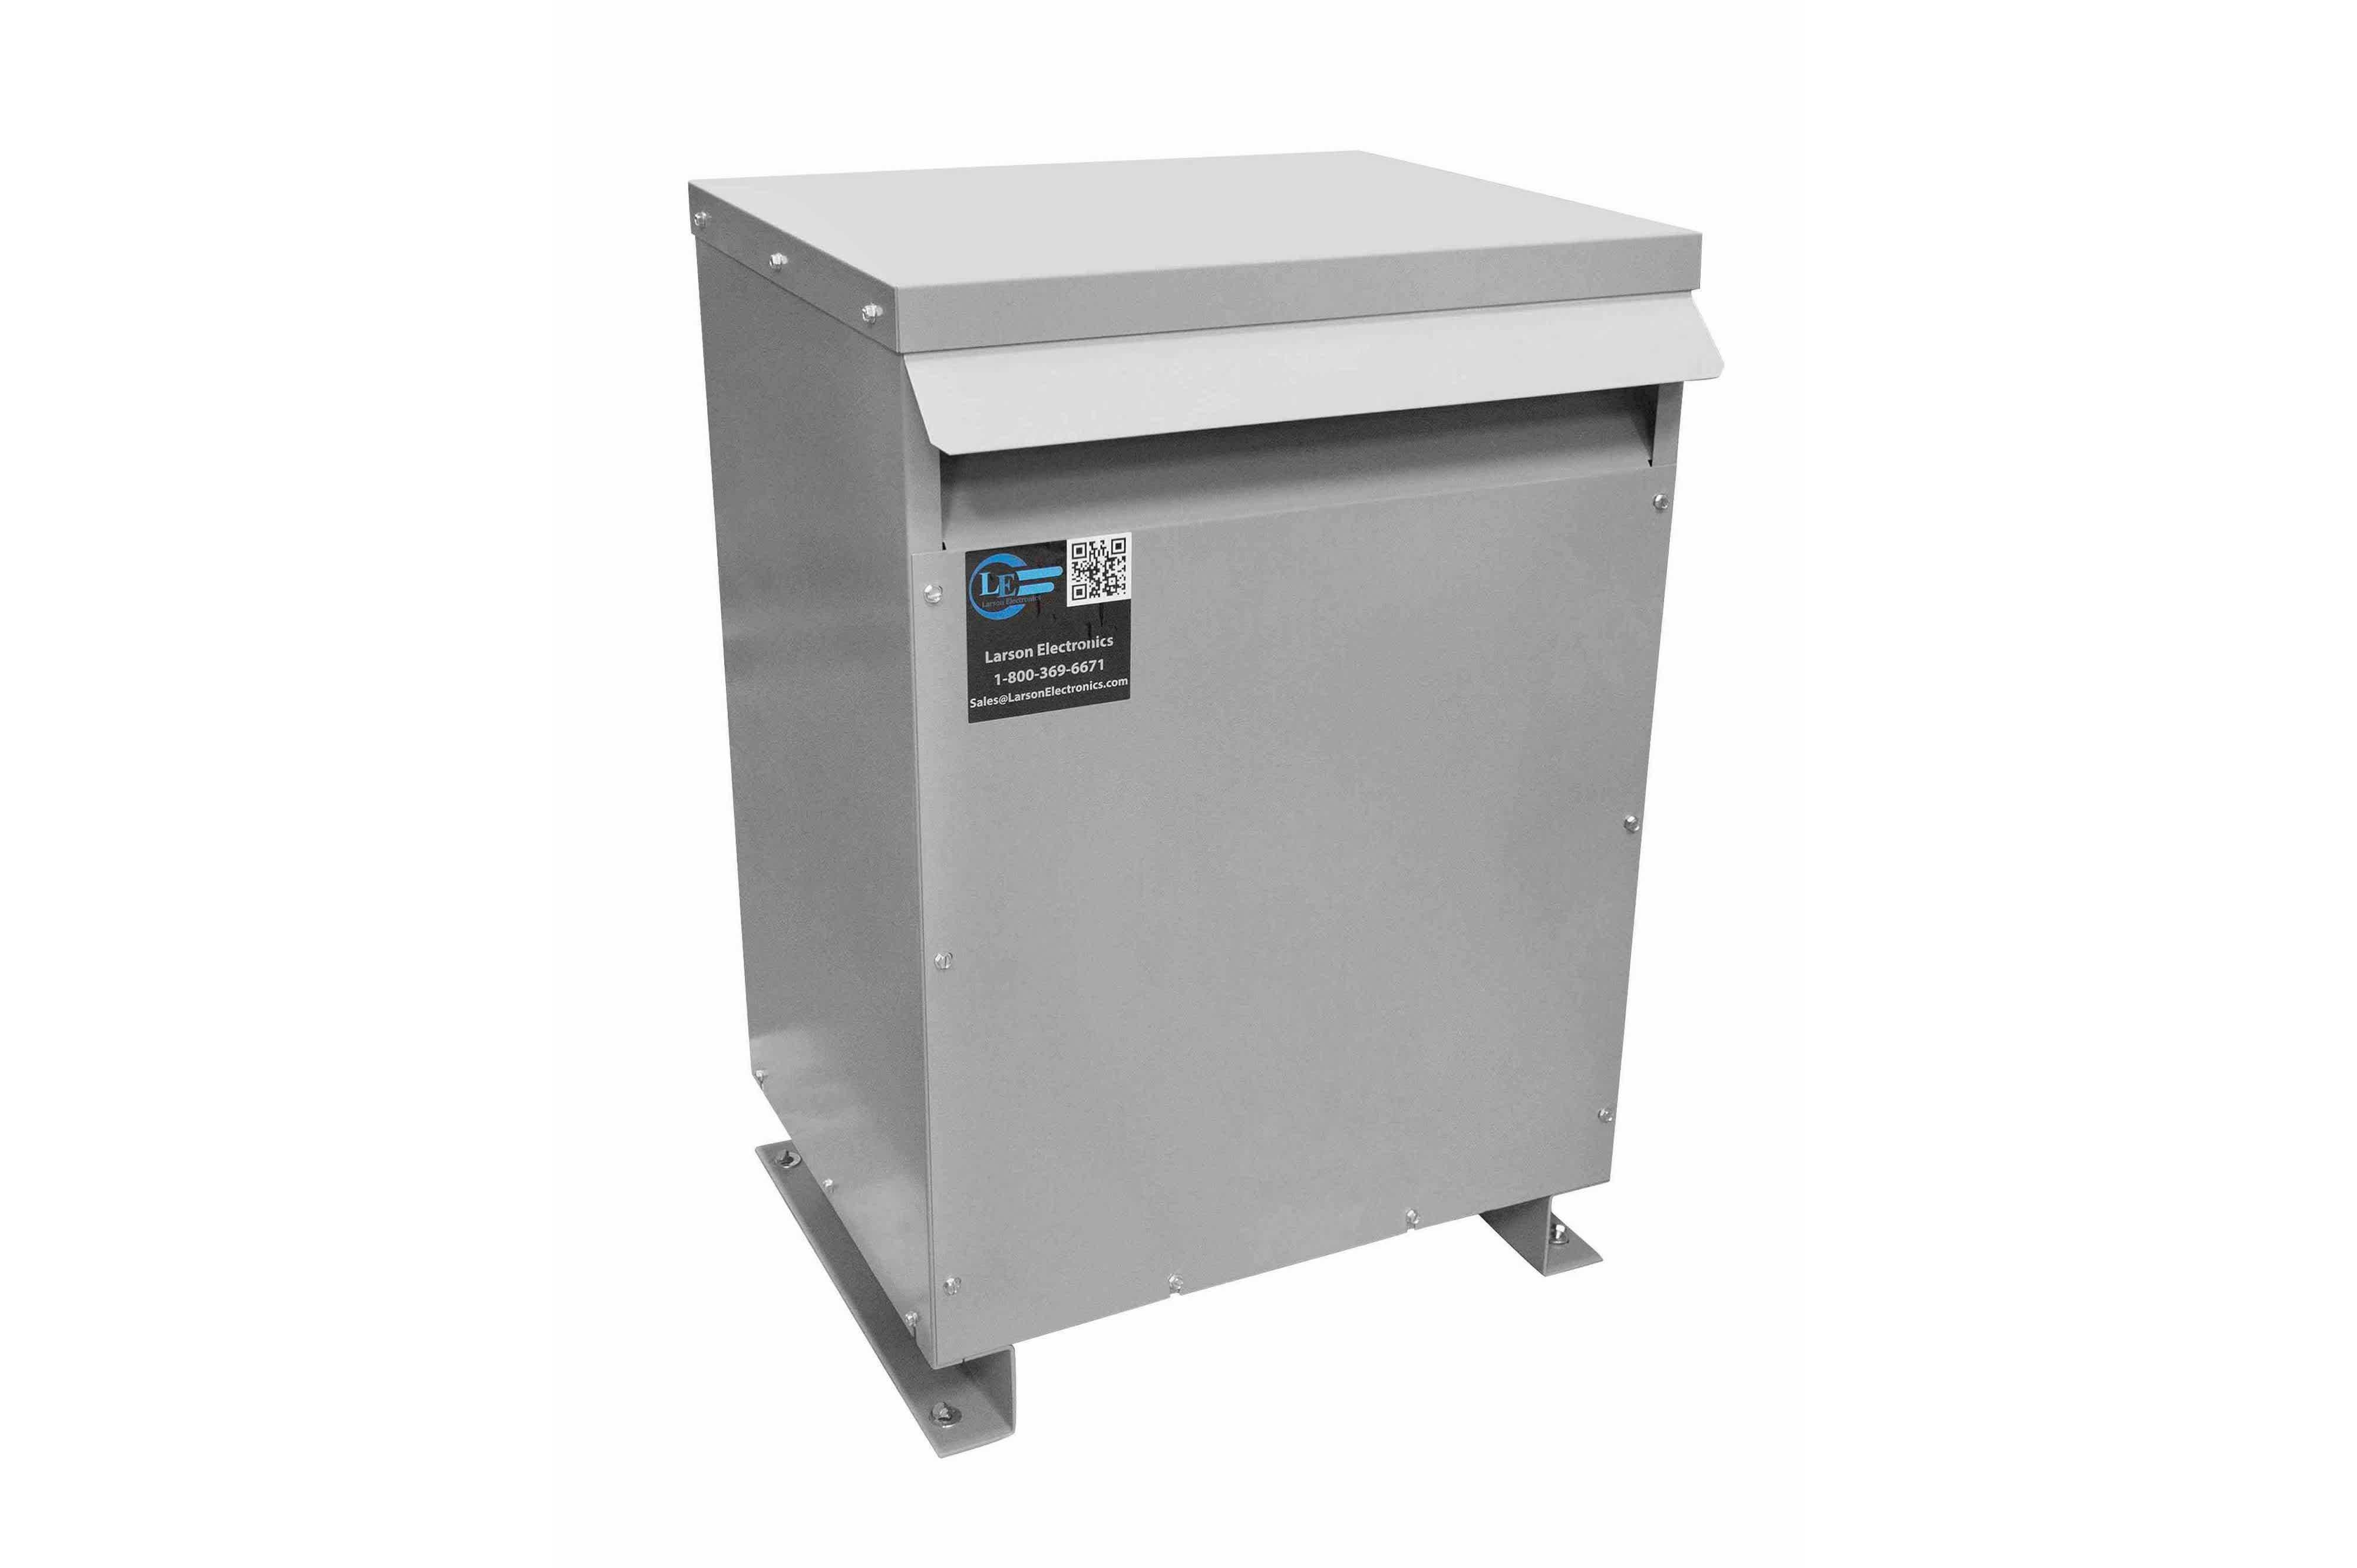 37.5 kVA 3PH Isolation Transformer, 460V Wye Primary, 240V Delta Secondary, N3R, Ventilated, 60 Hz